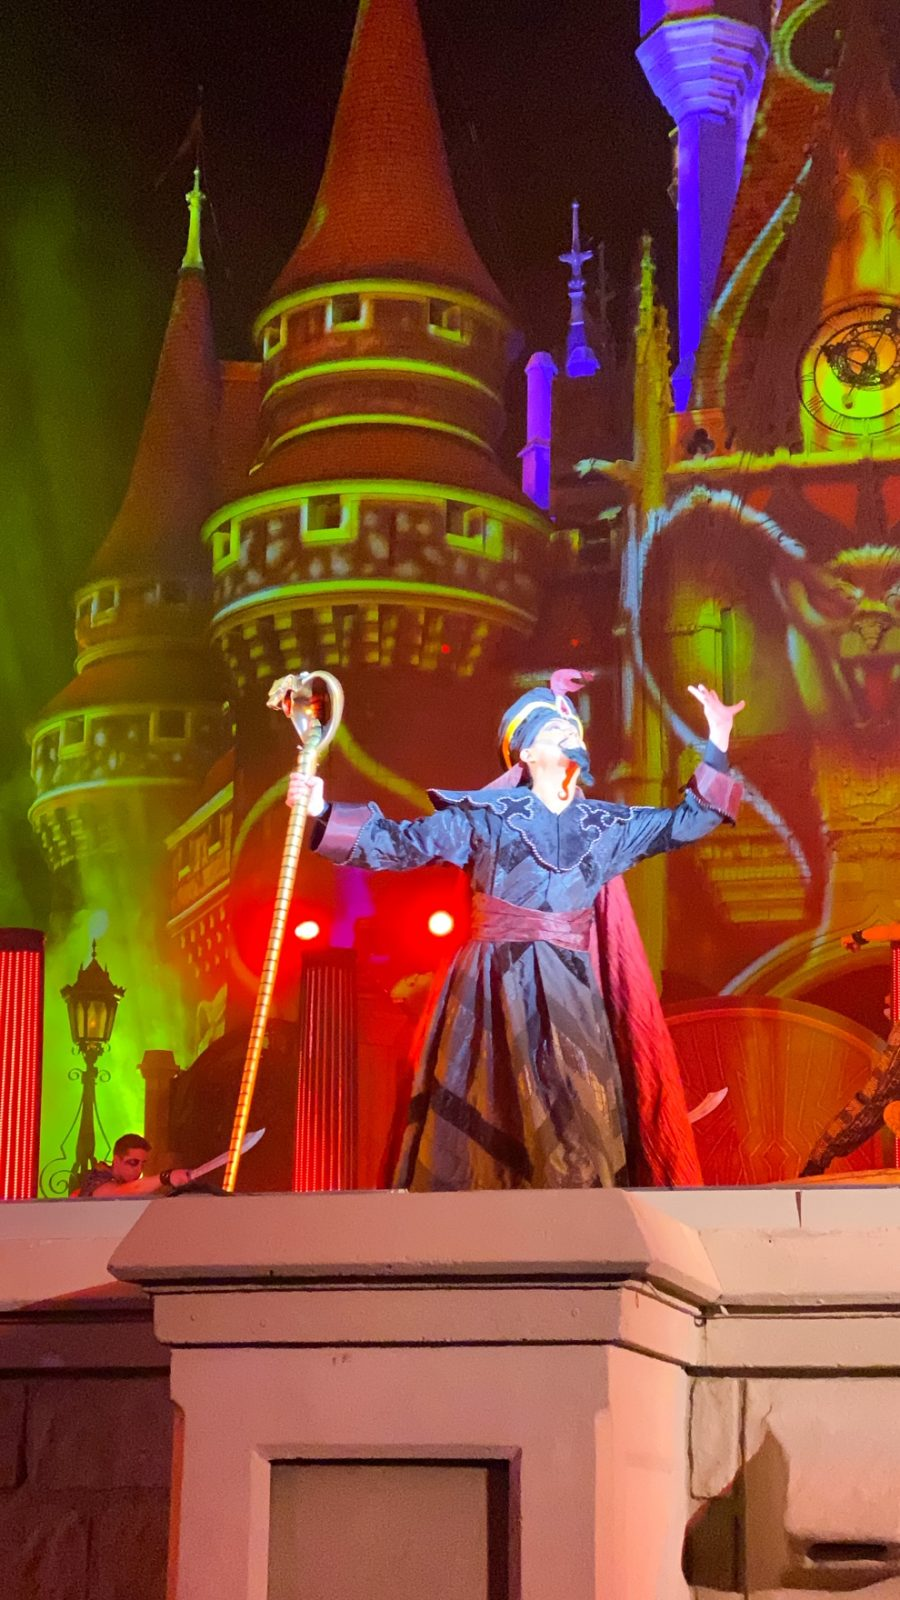 Jafar at Villains after hours at Disney